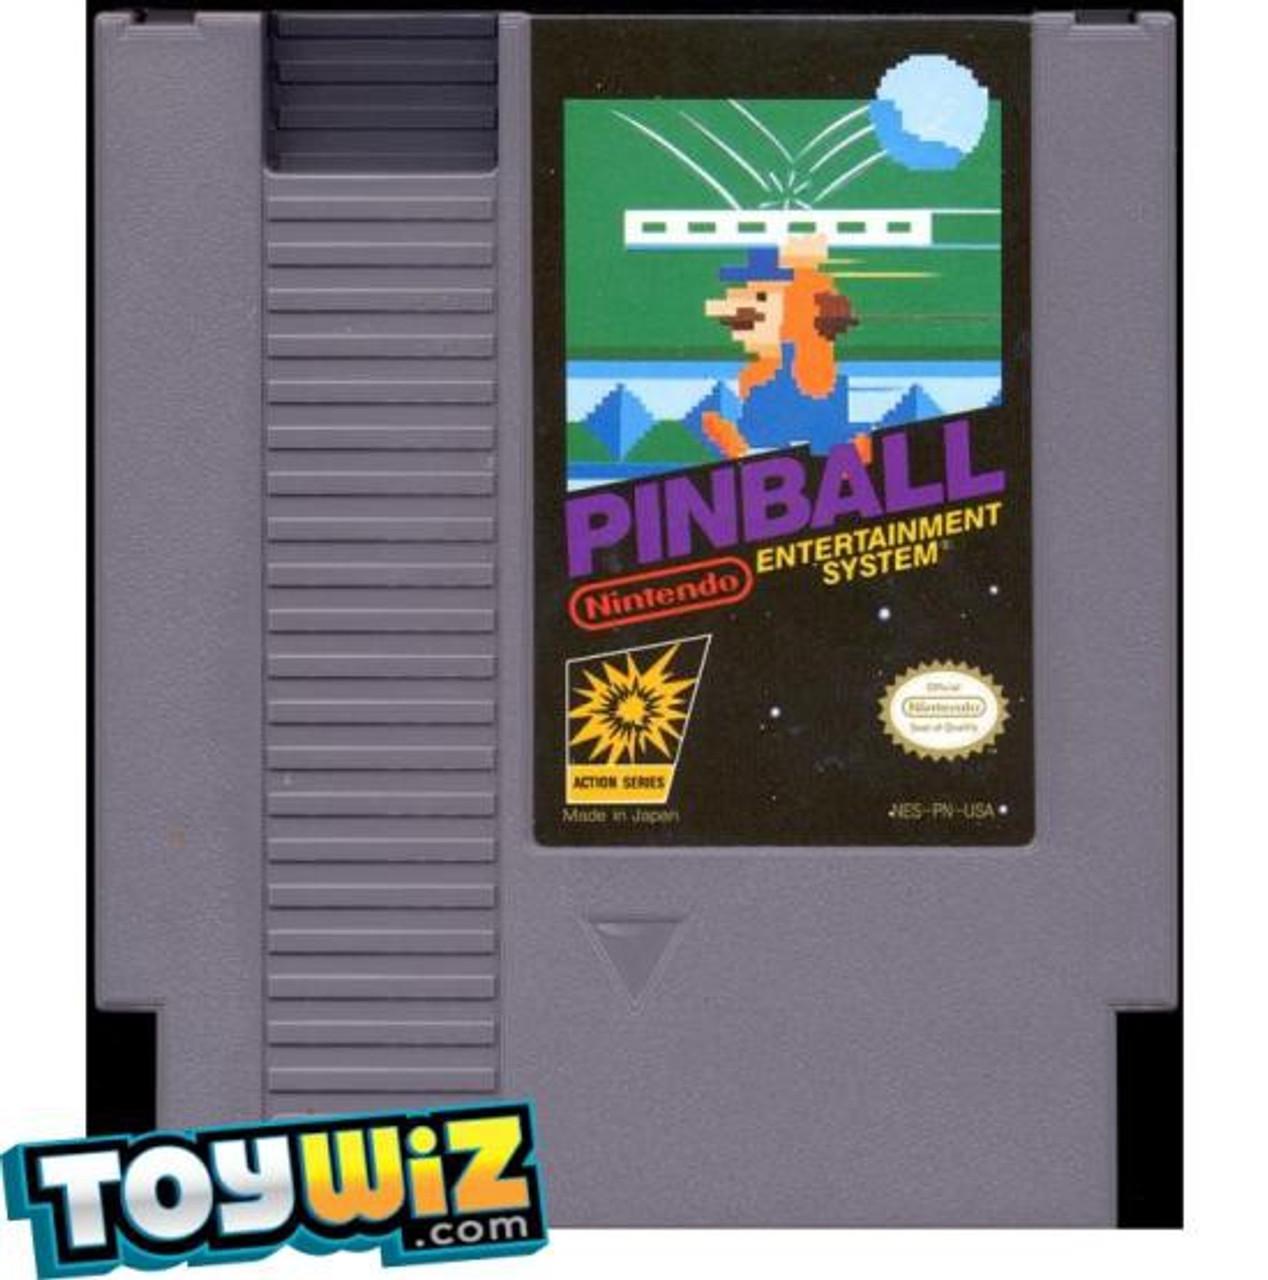 Nintendo NES Pinball Video Game Cartridge [Played Condition]